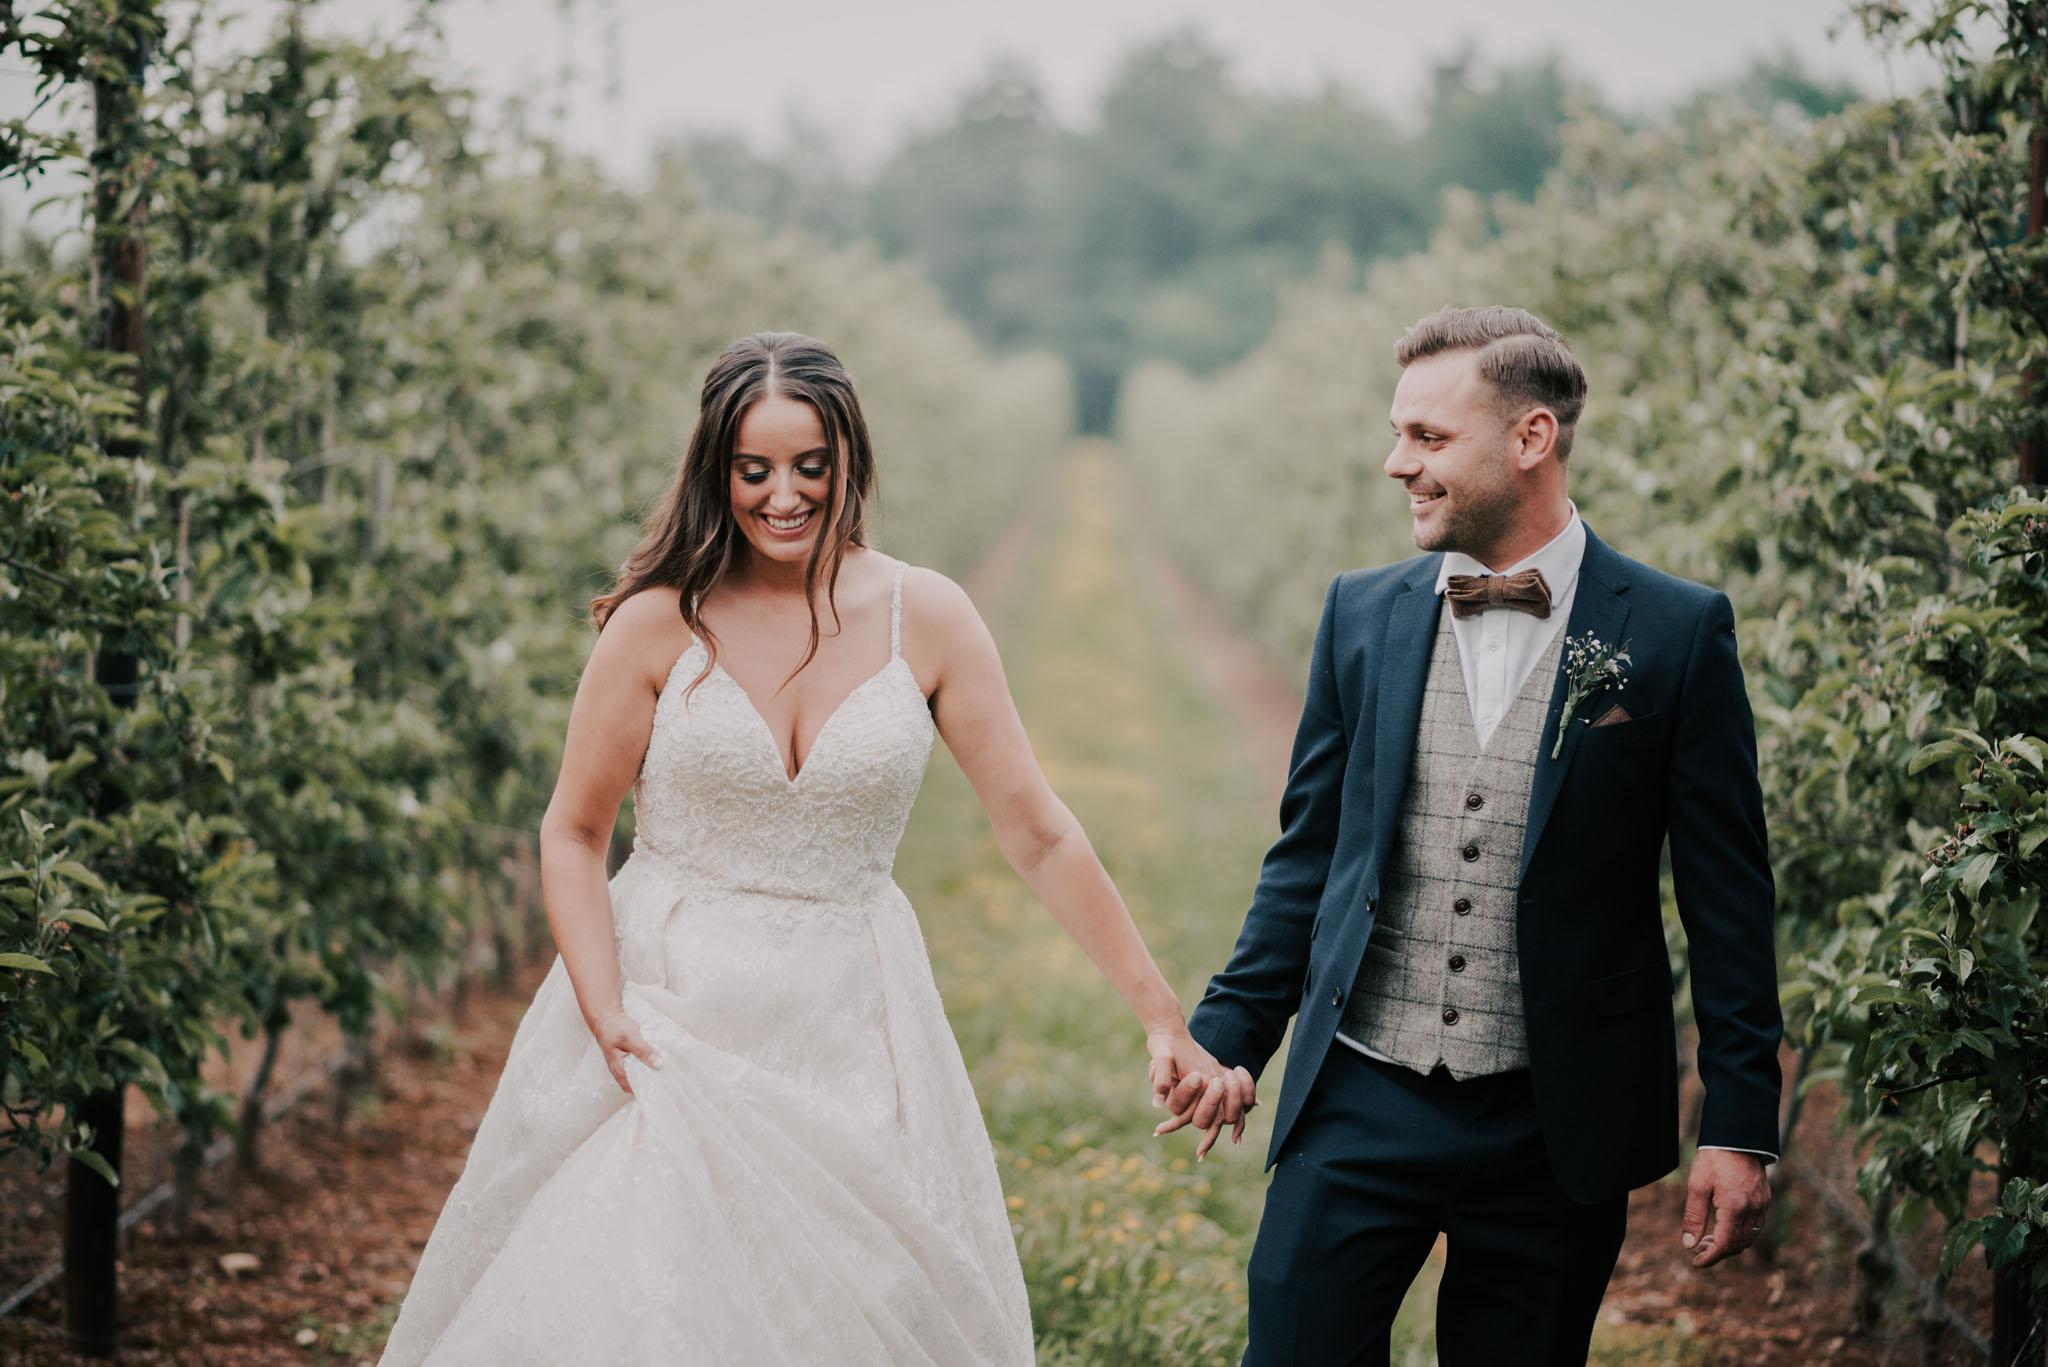 wedding-photographer-glewstone-court-hereford-scott-stockwell-photography462.jpg